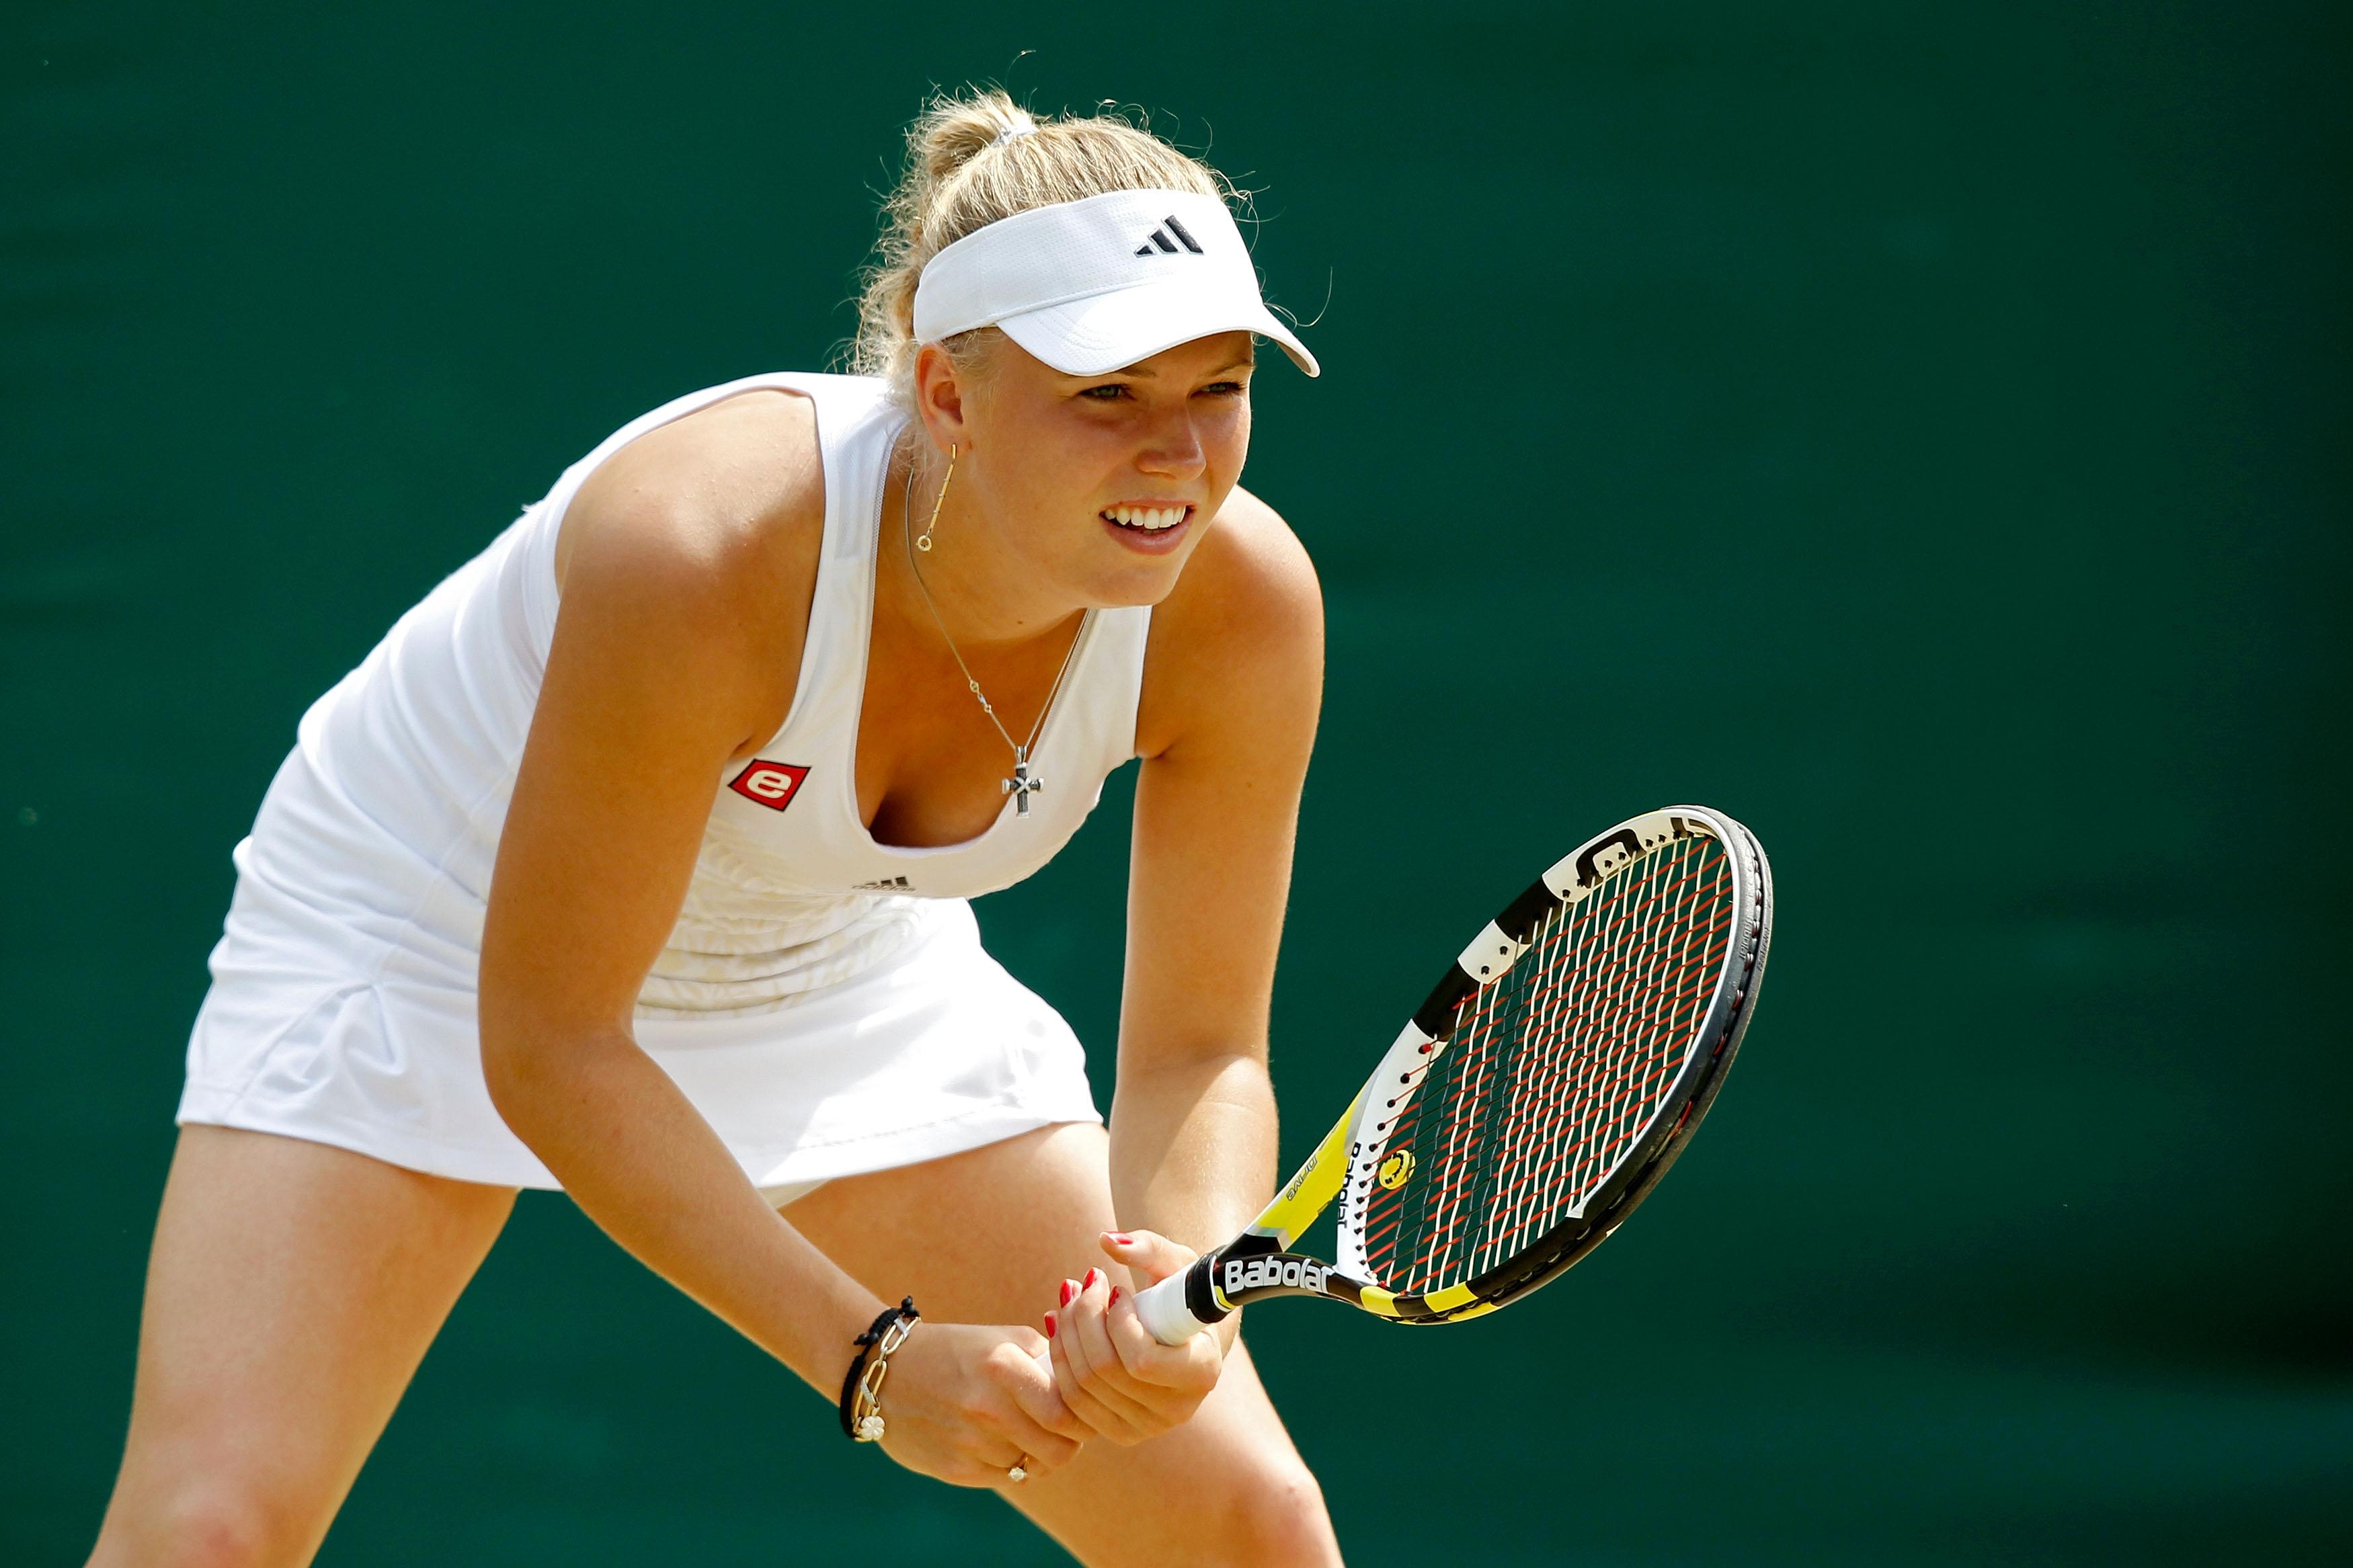 Caroline Wozniacki at Wimbledon in 2010.